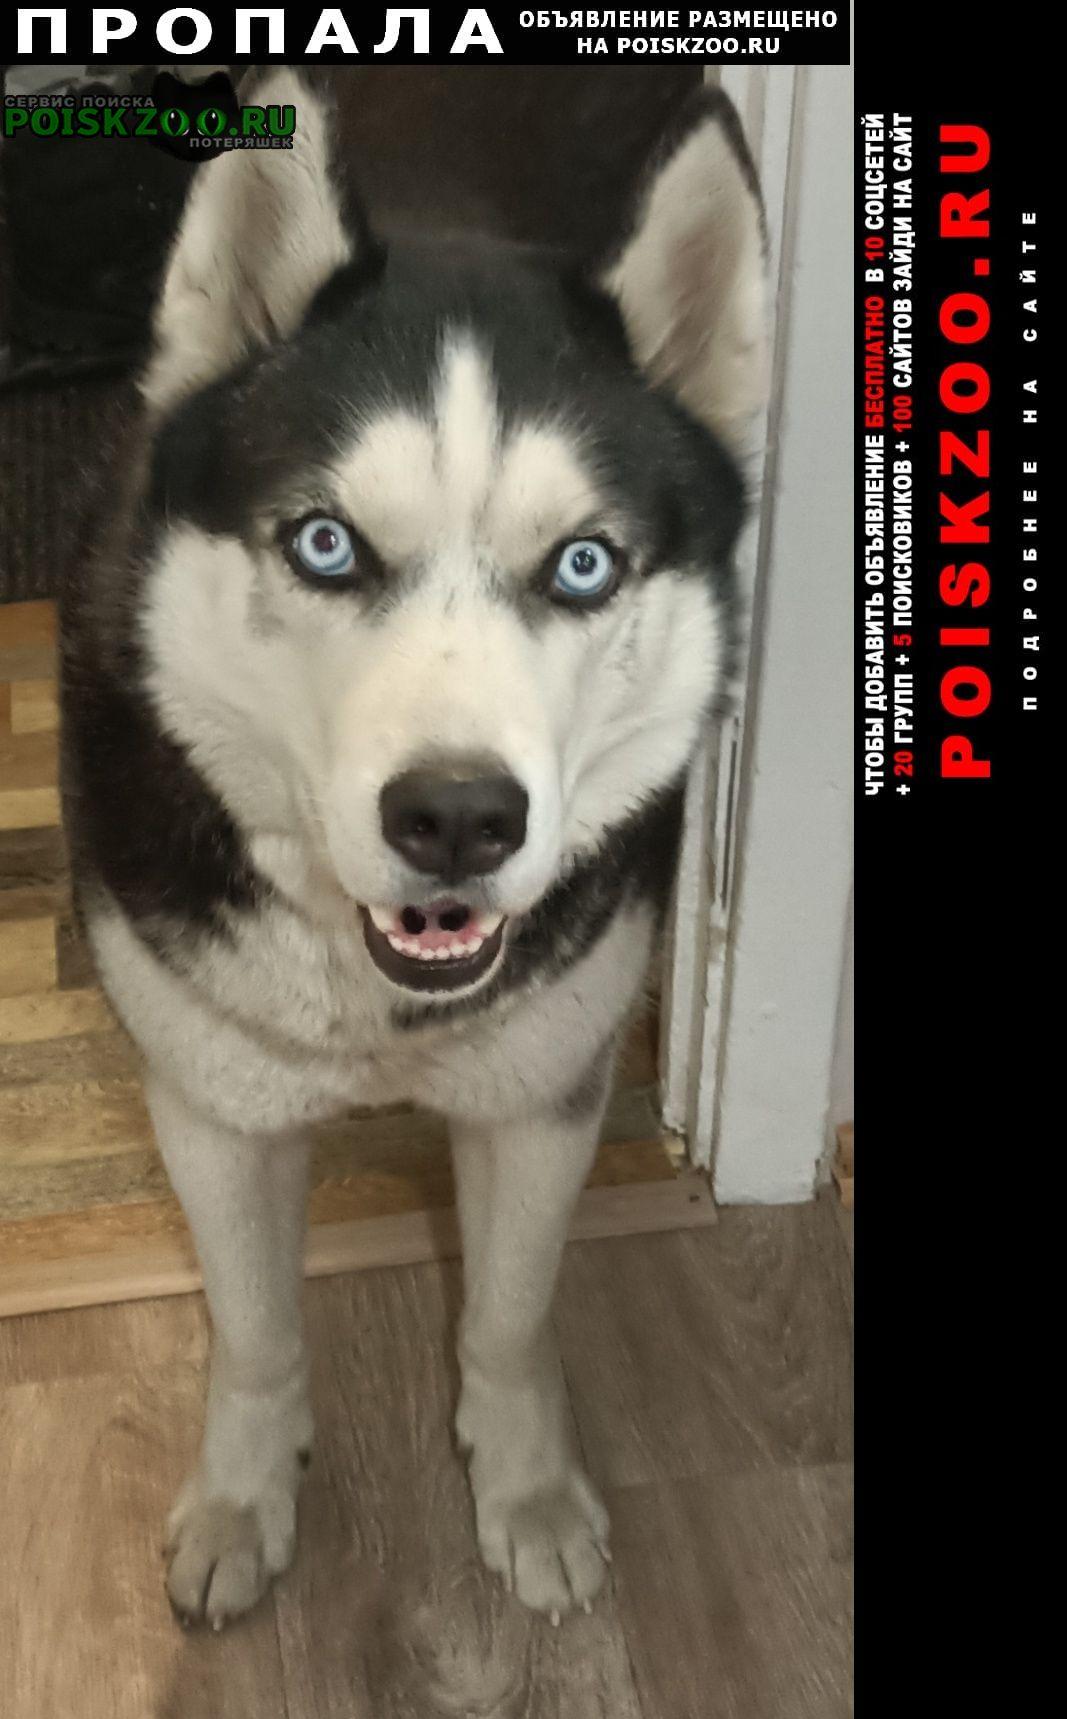 Пропала собака кобель породы хаски Чита